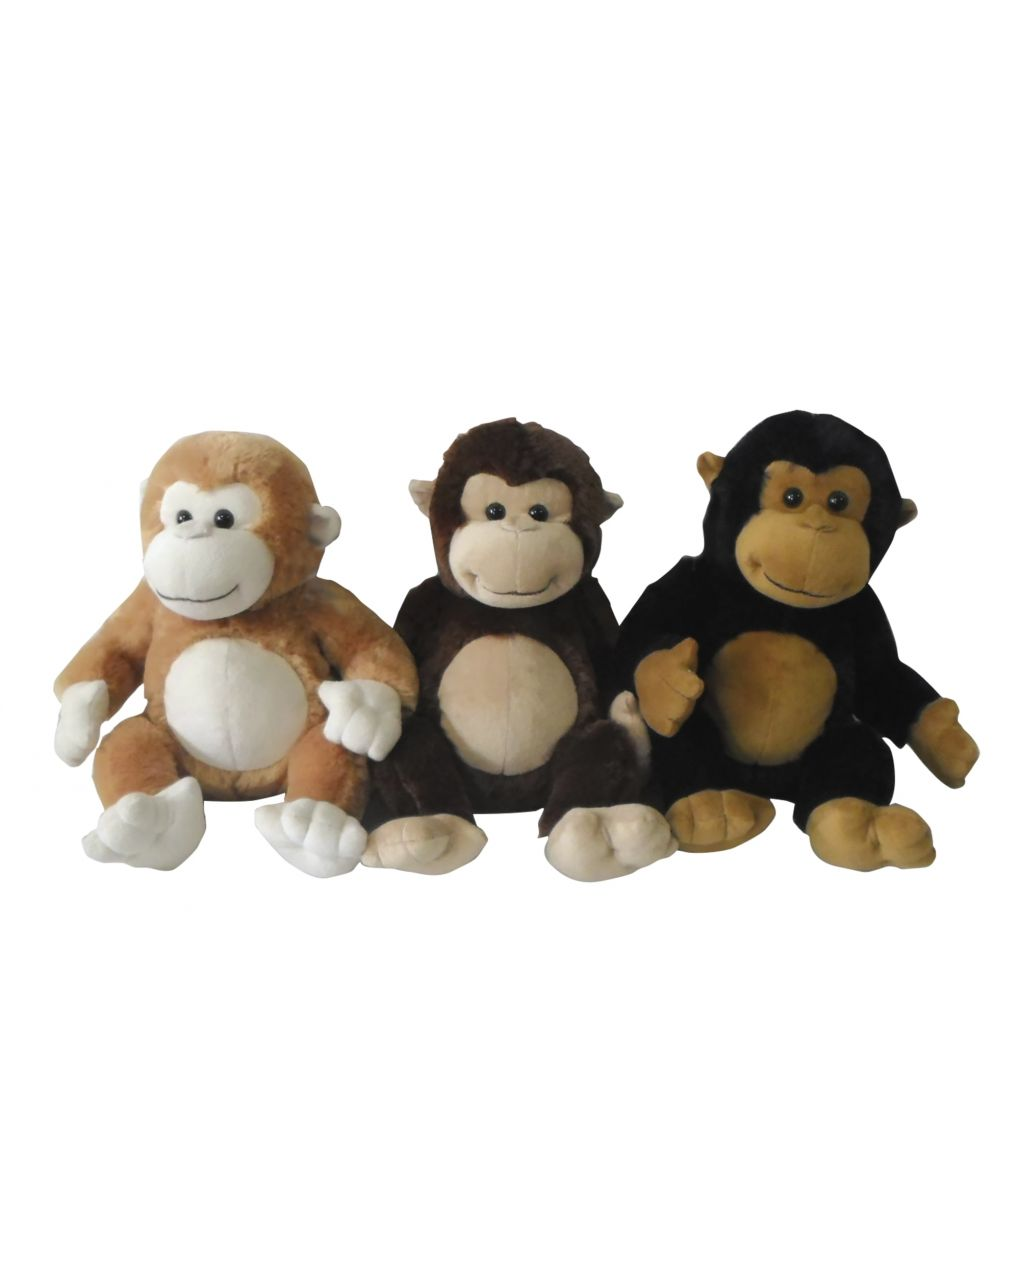 Ami plush  - monkey - Ami Plush